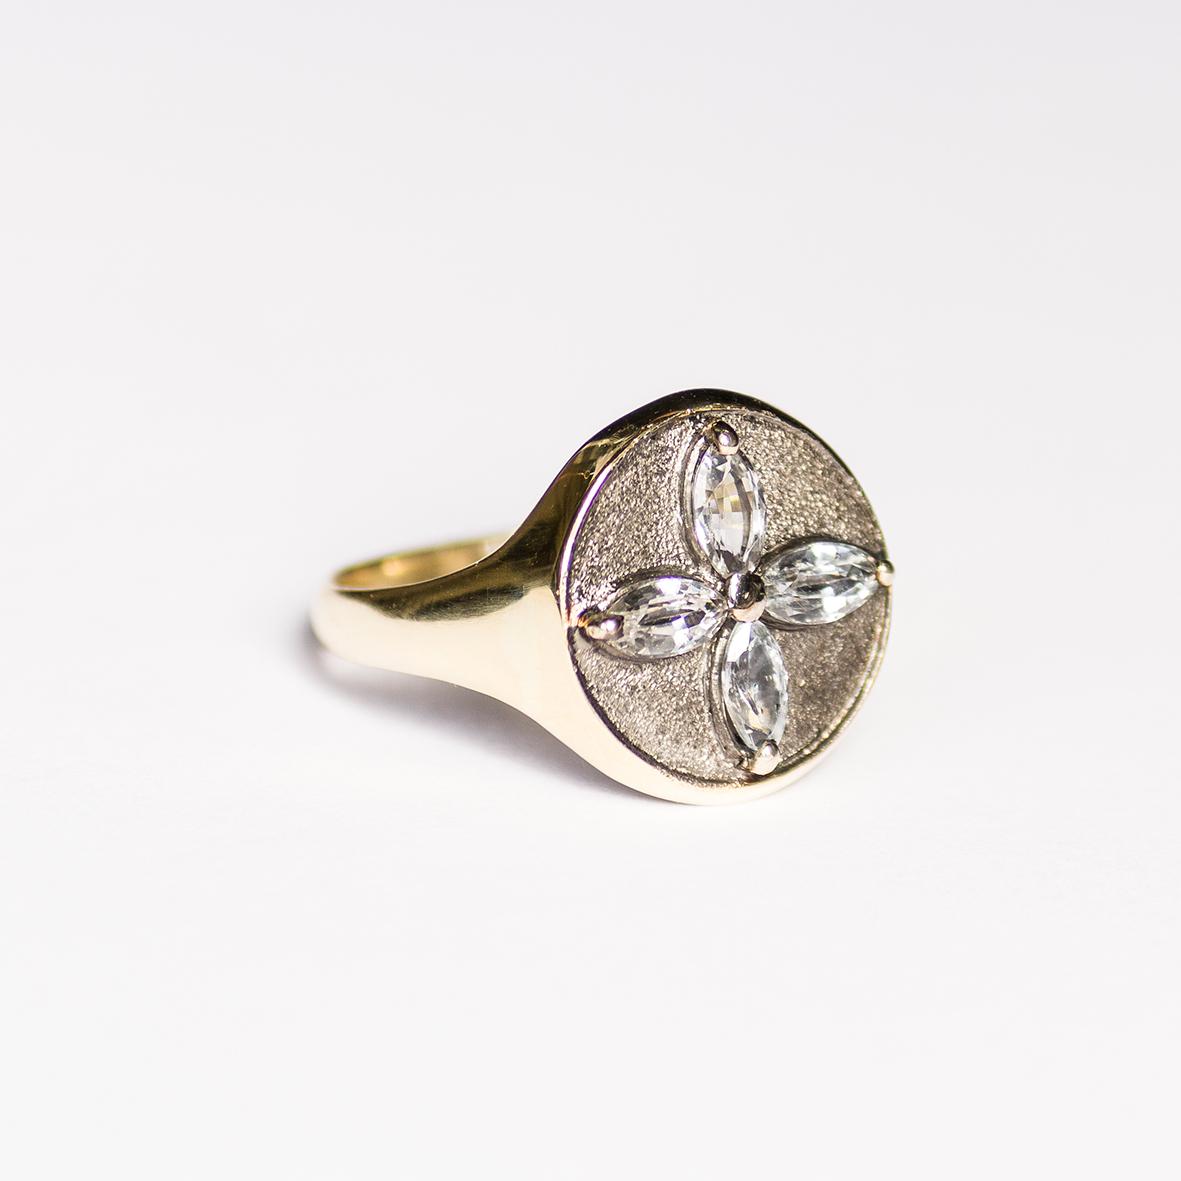 3. OONA_lotus_principal_signet flower sapphire ring 1